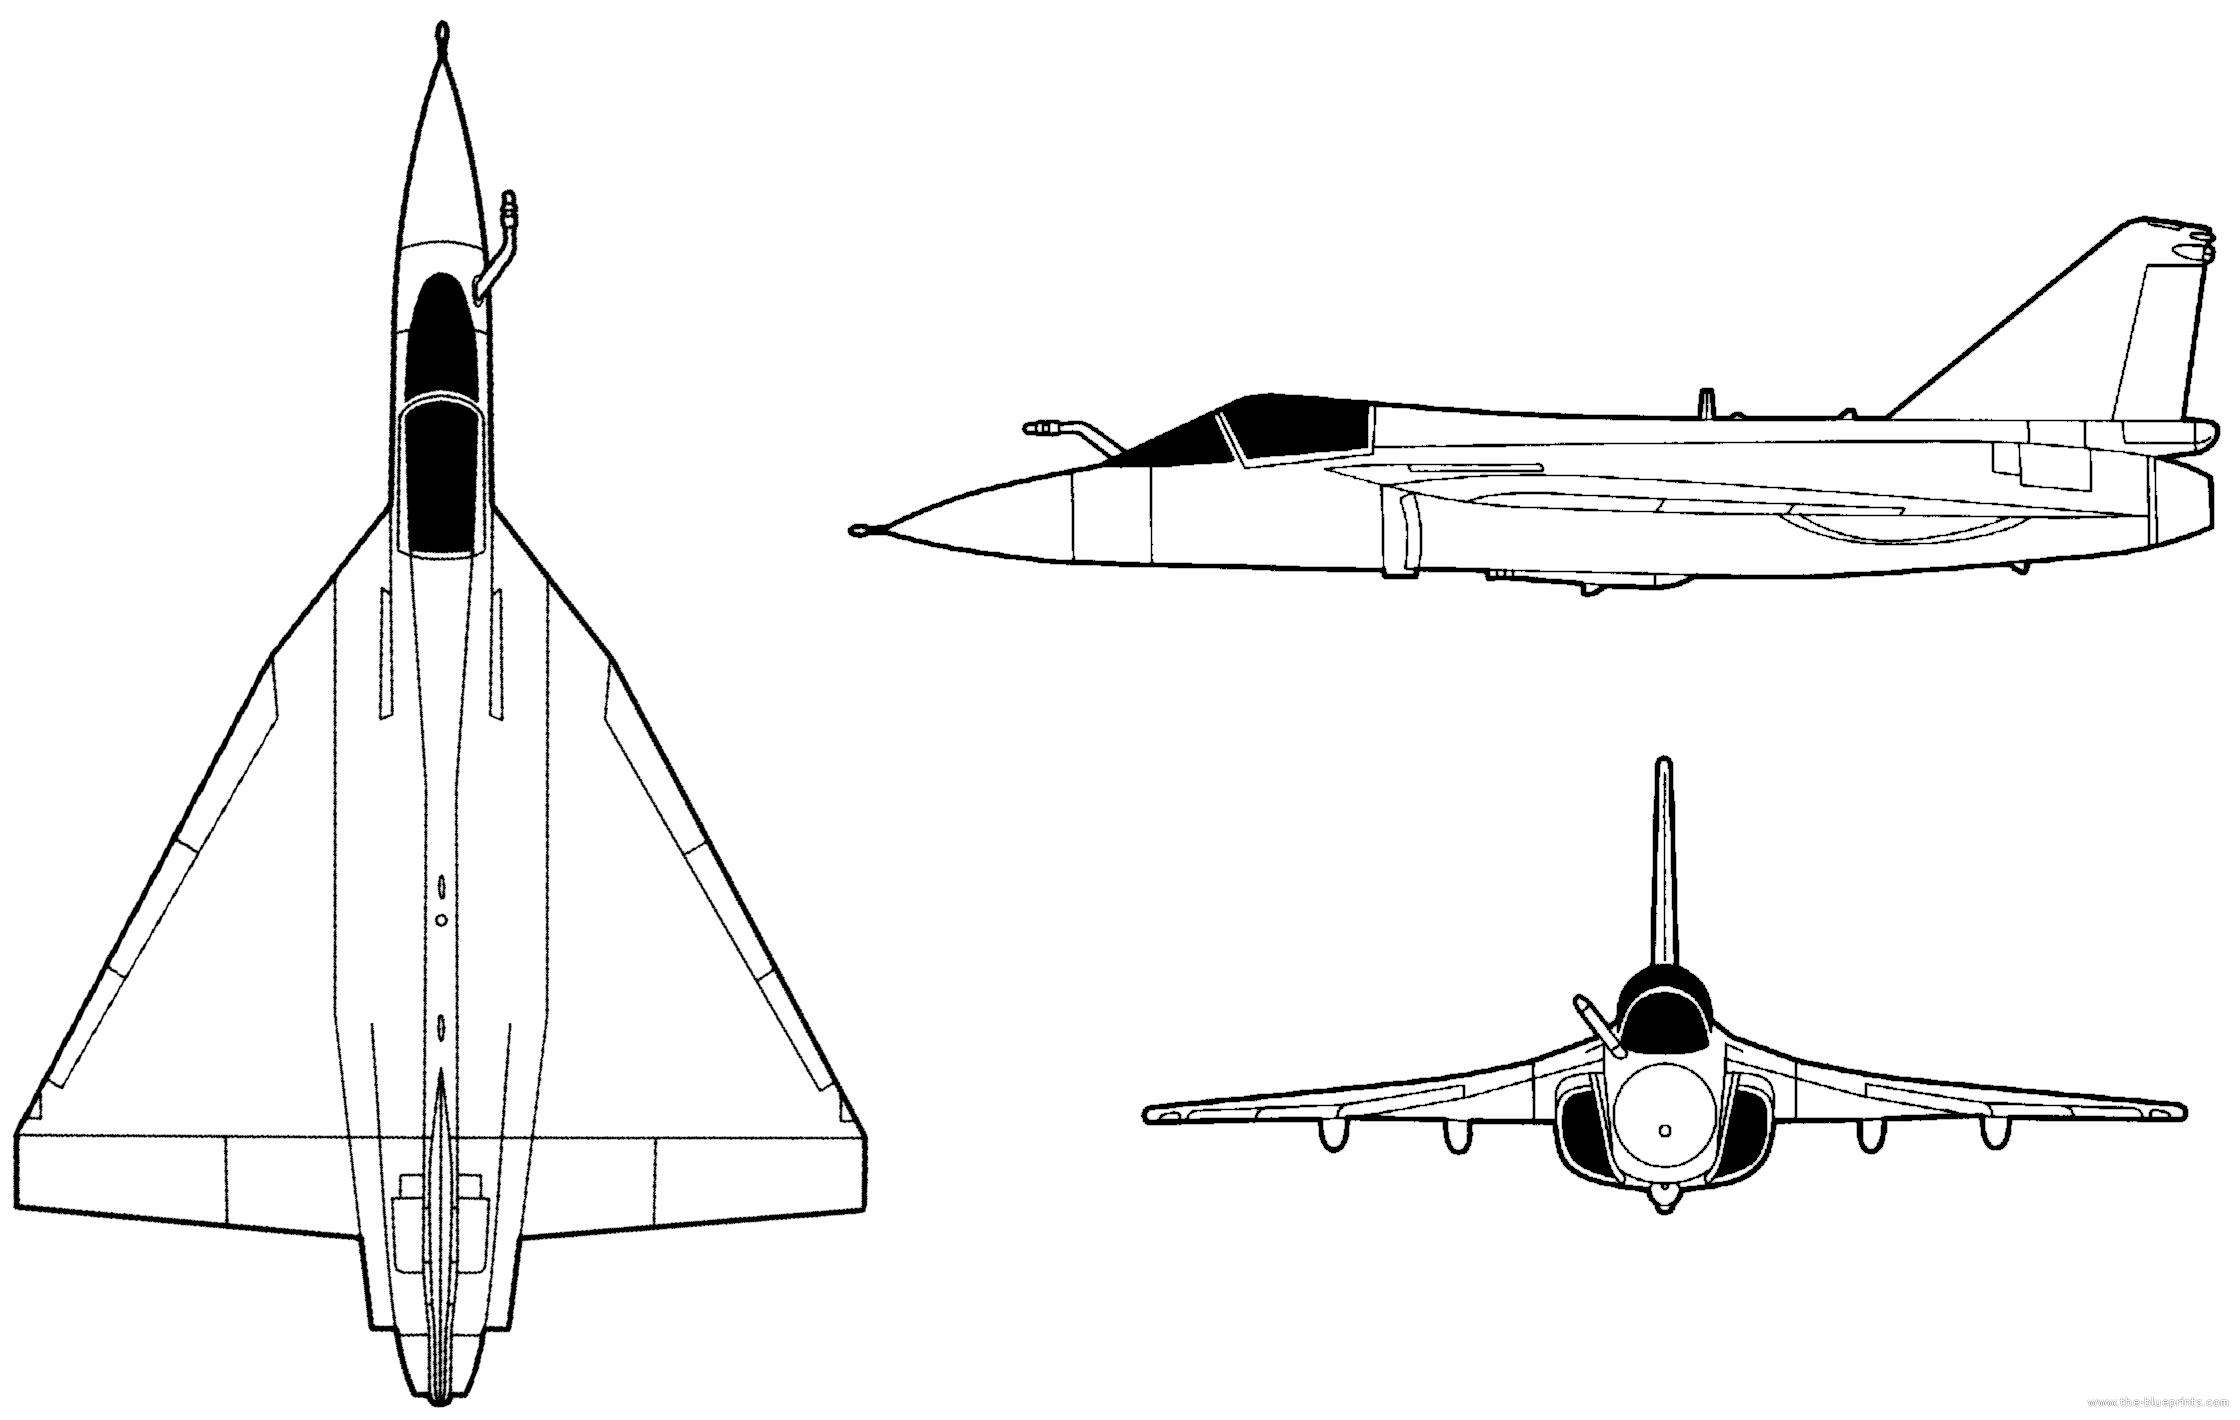 Blueprints Gt Modern Airplanes Gt Modern H Gt Hal Lca Tejas